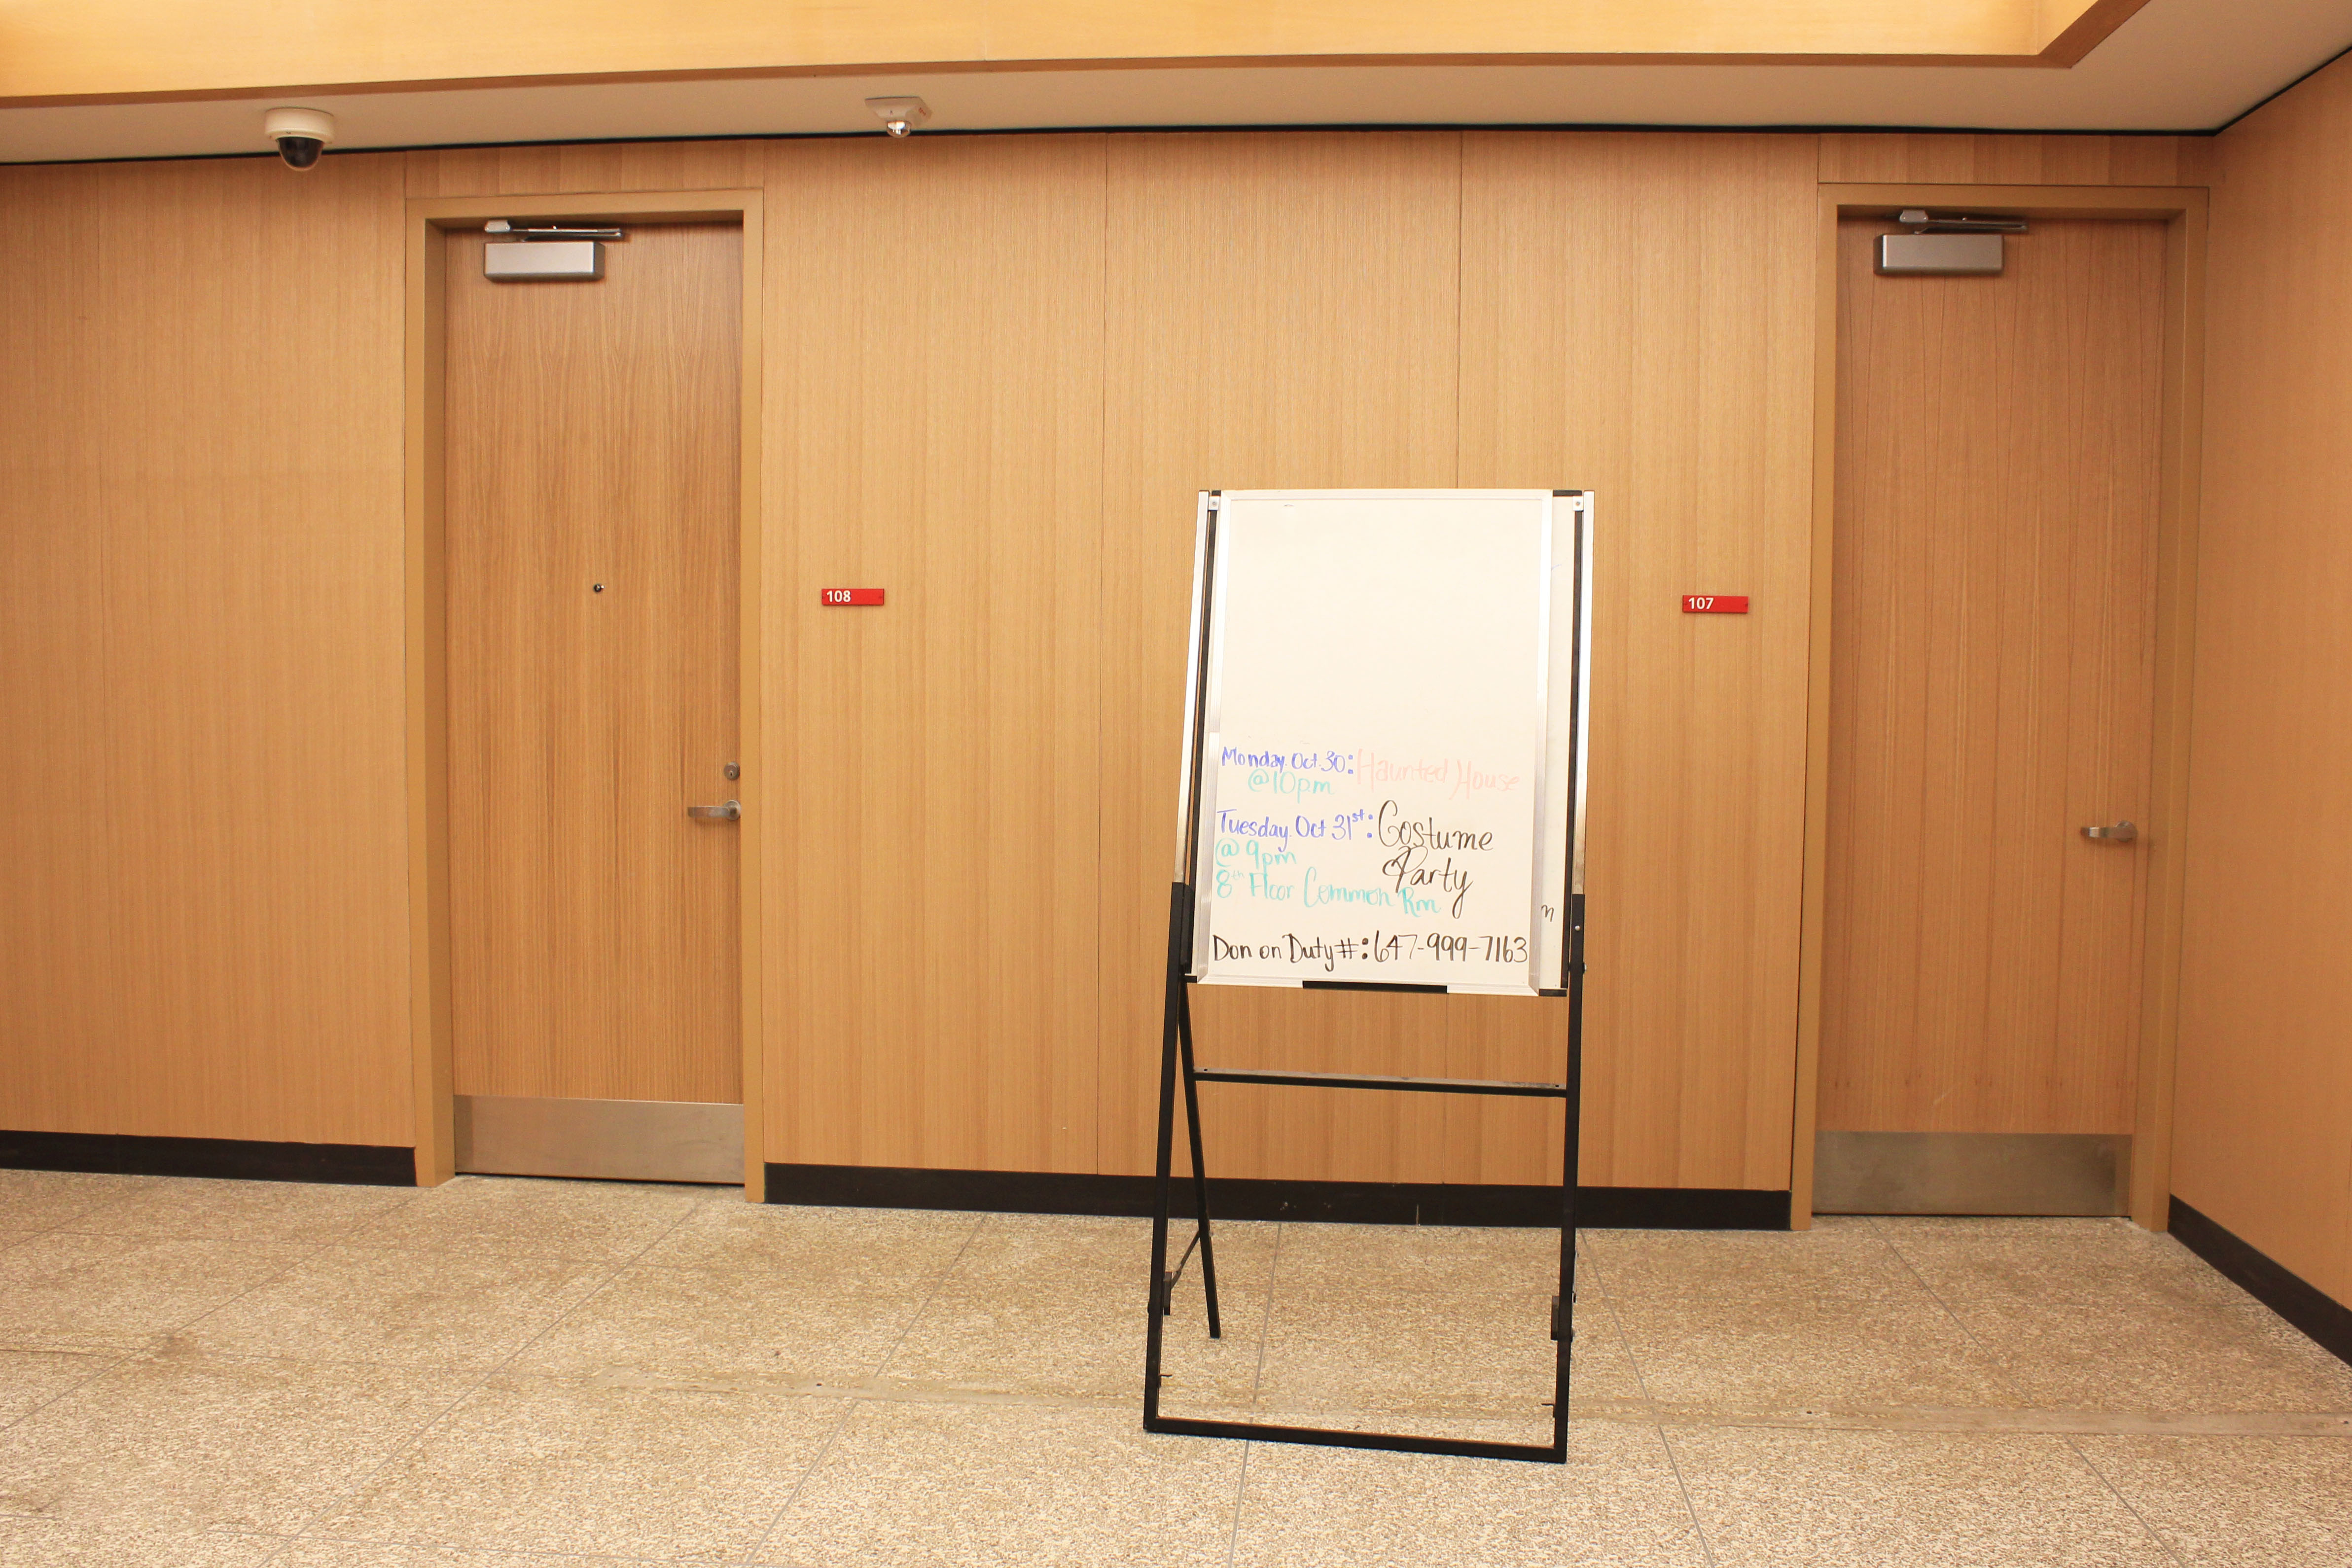 image of tatham lobby